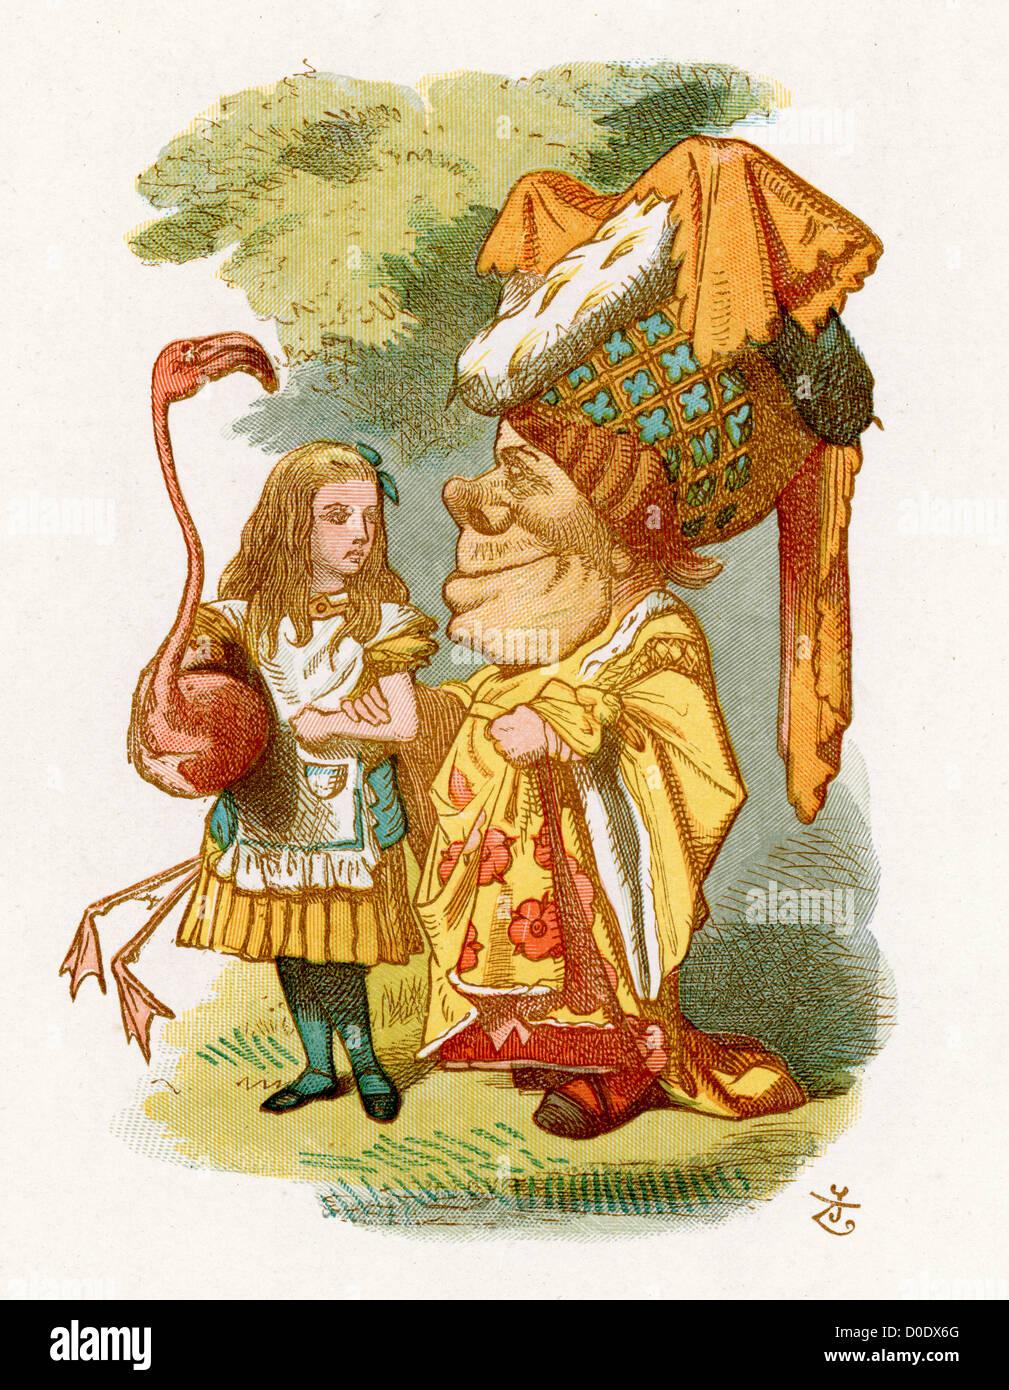 Alice Wonderland Rabbit Costume Male